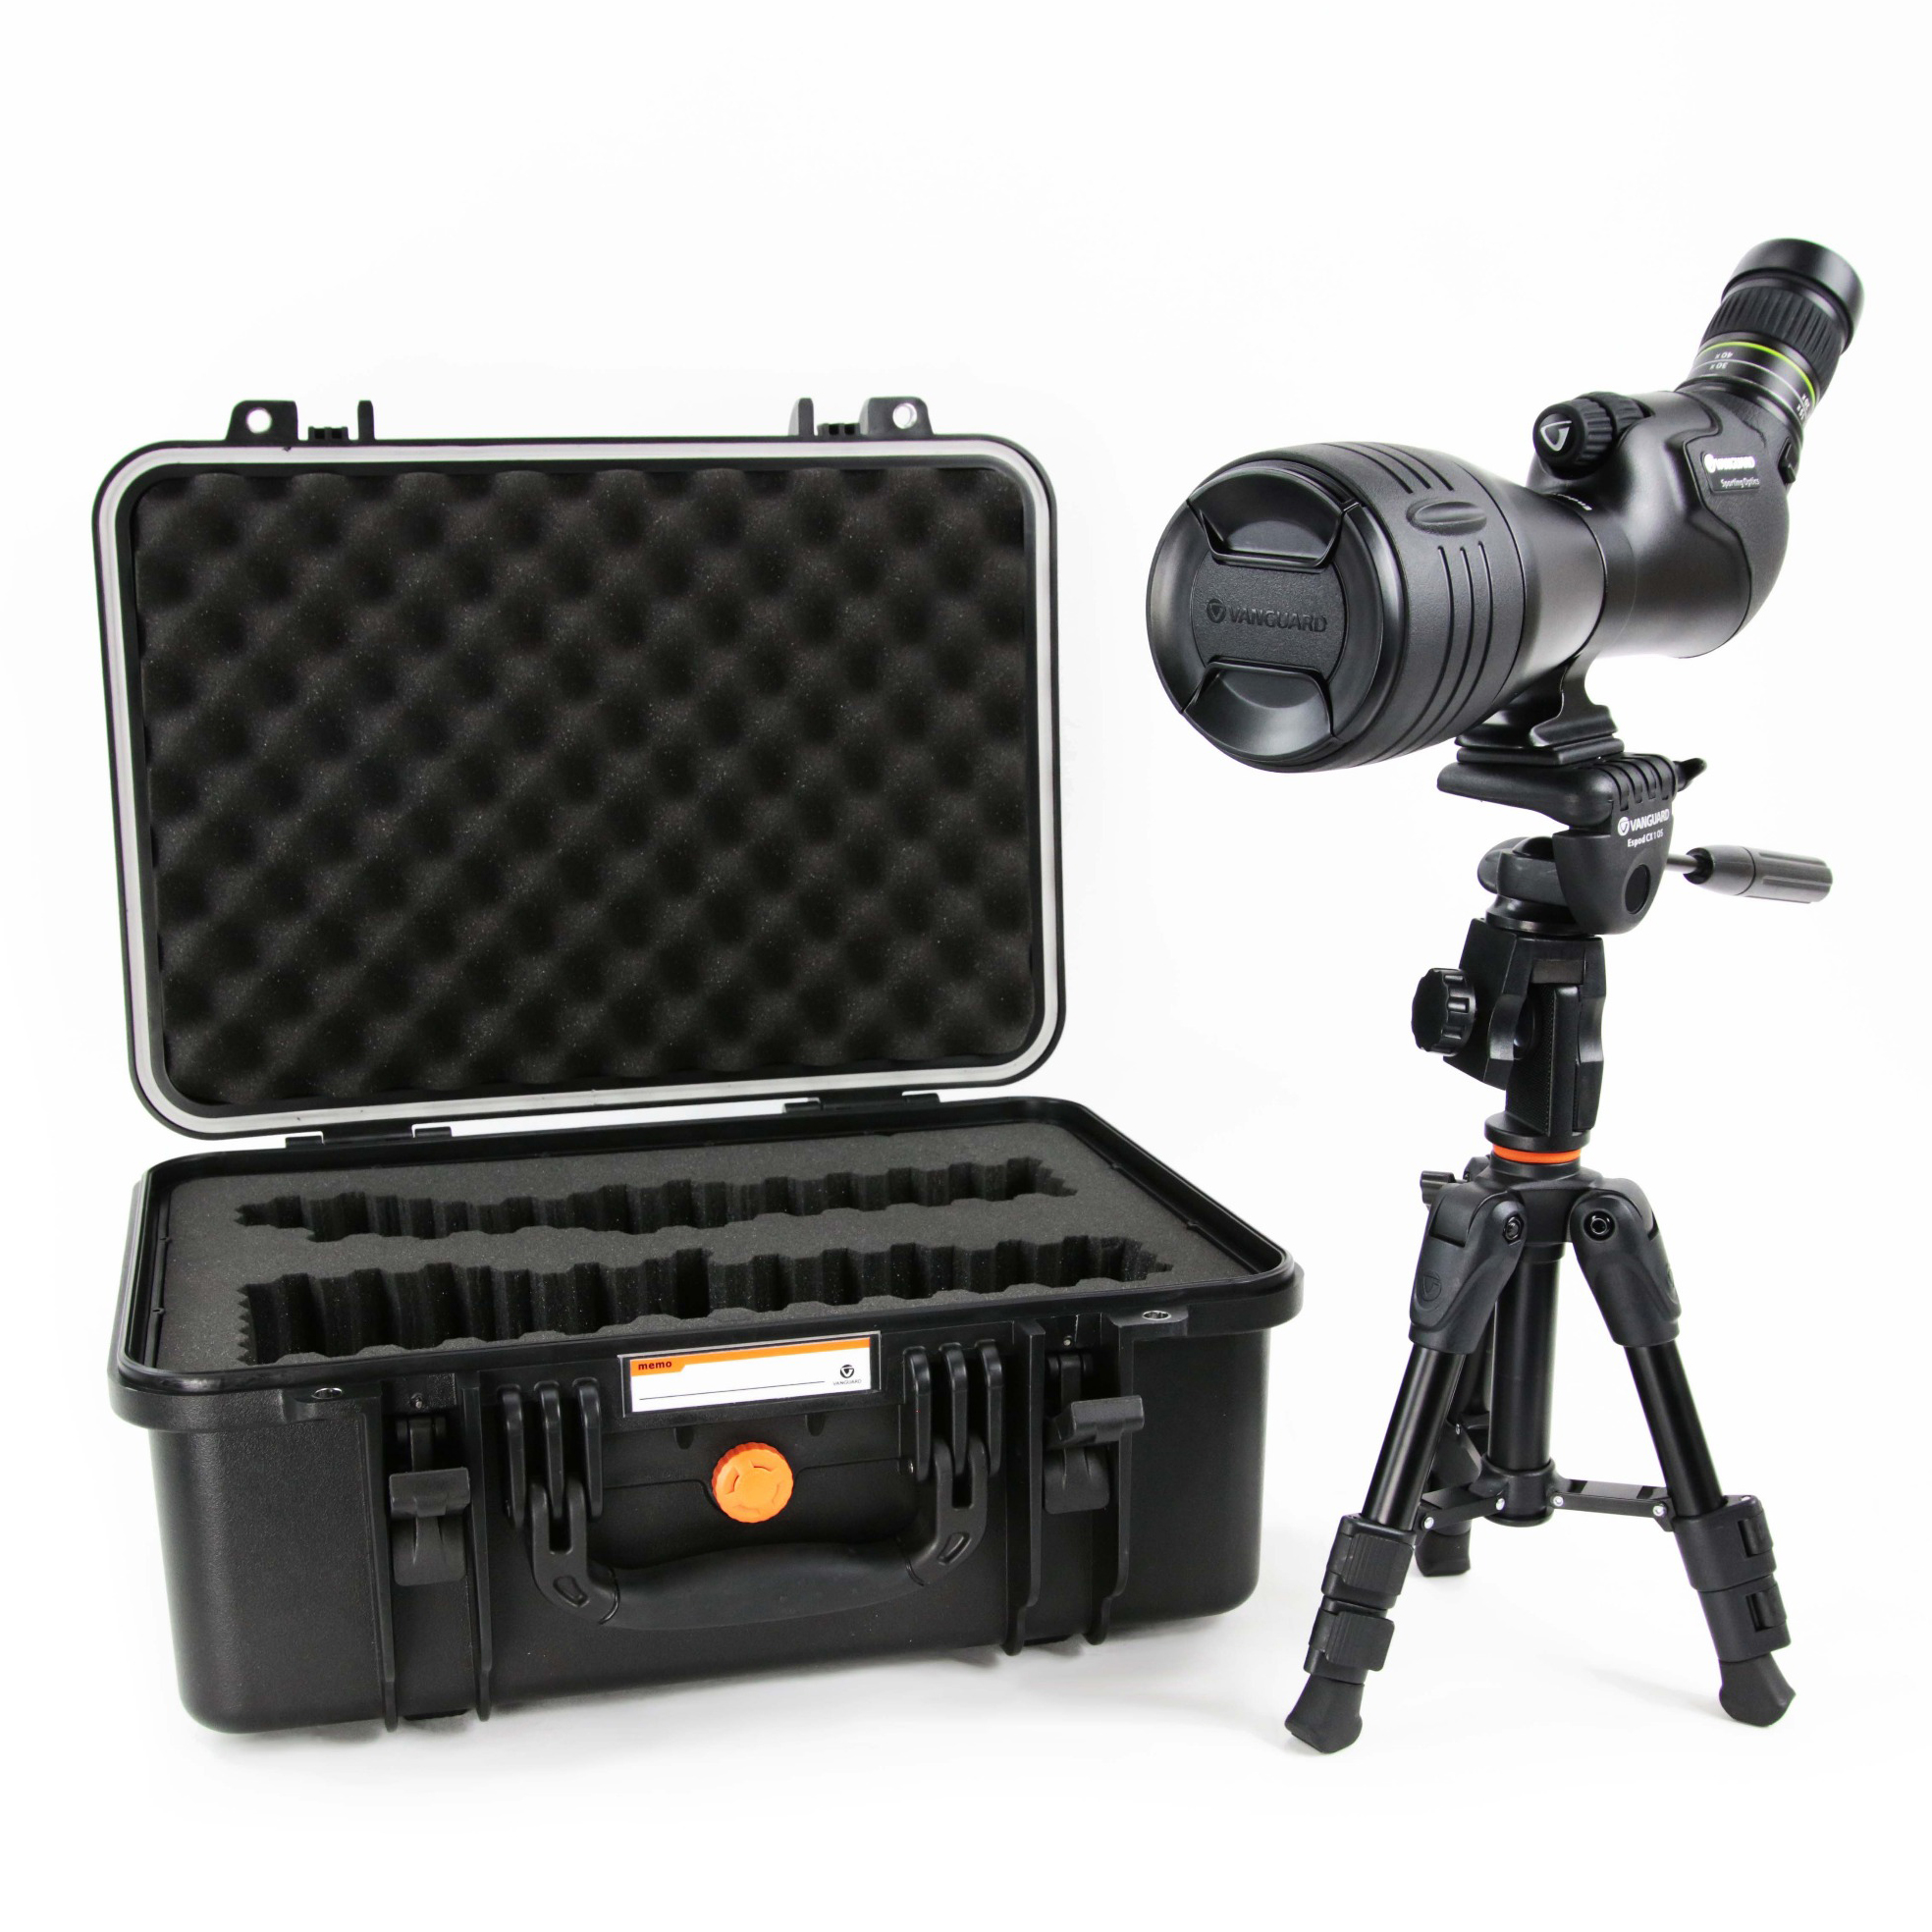 Vanguard Endeavor HD 82A 20-60 x 82 Spotting Scope with Bonus Tripod and Case